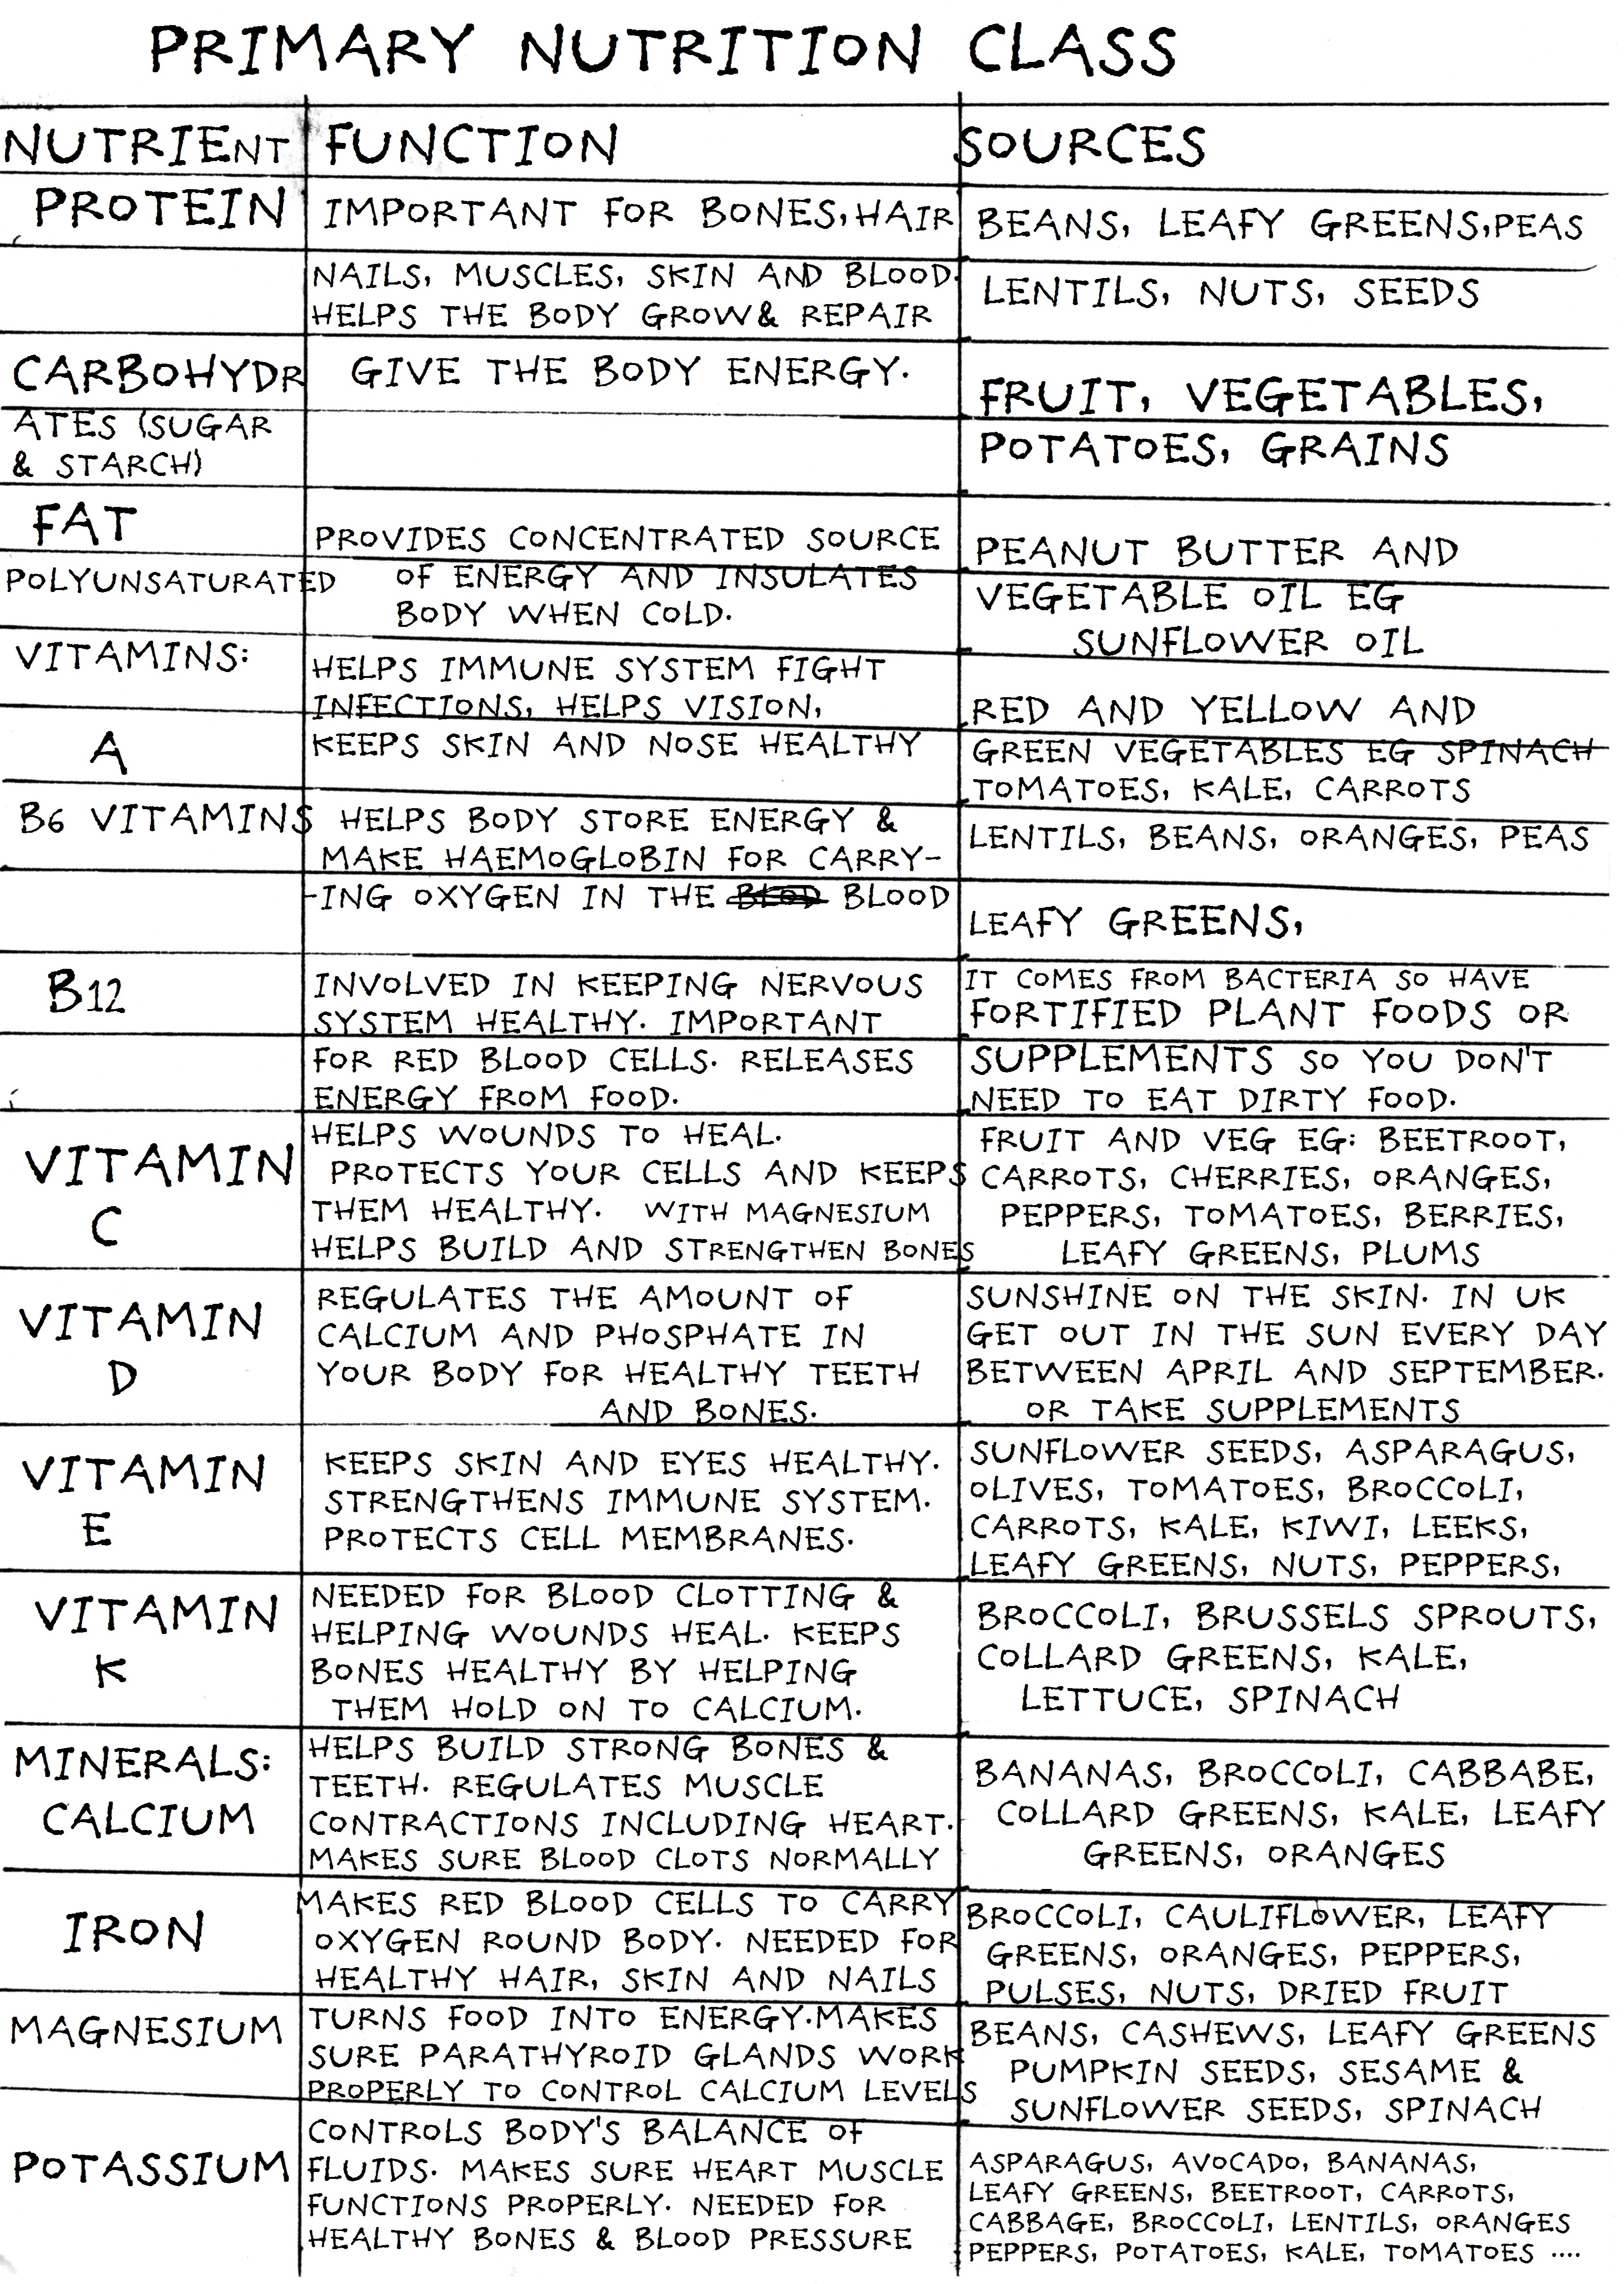 Luke's primary nutrition class chart (2)